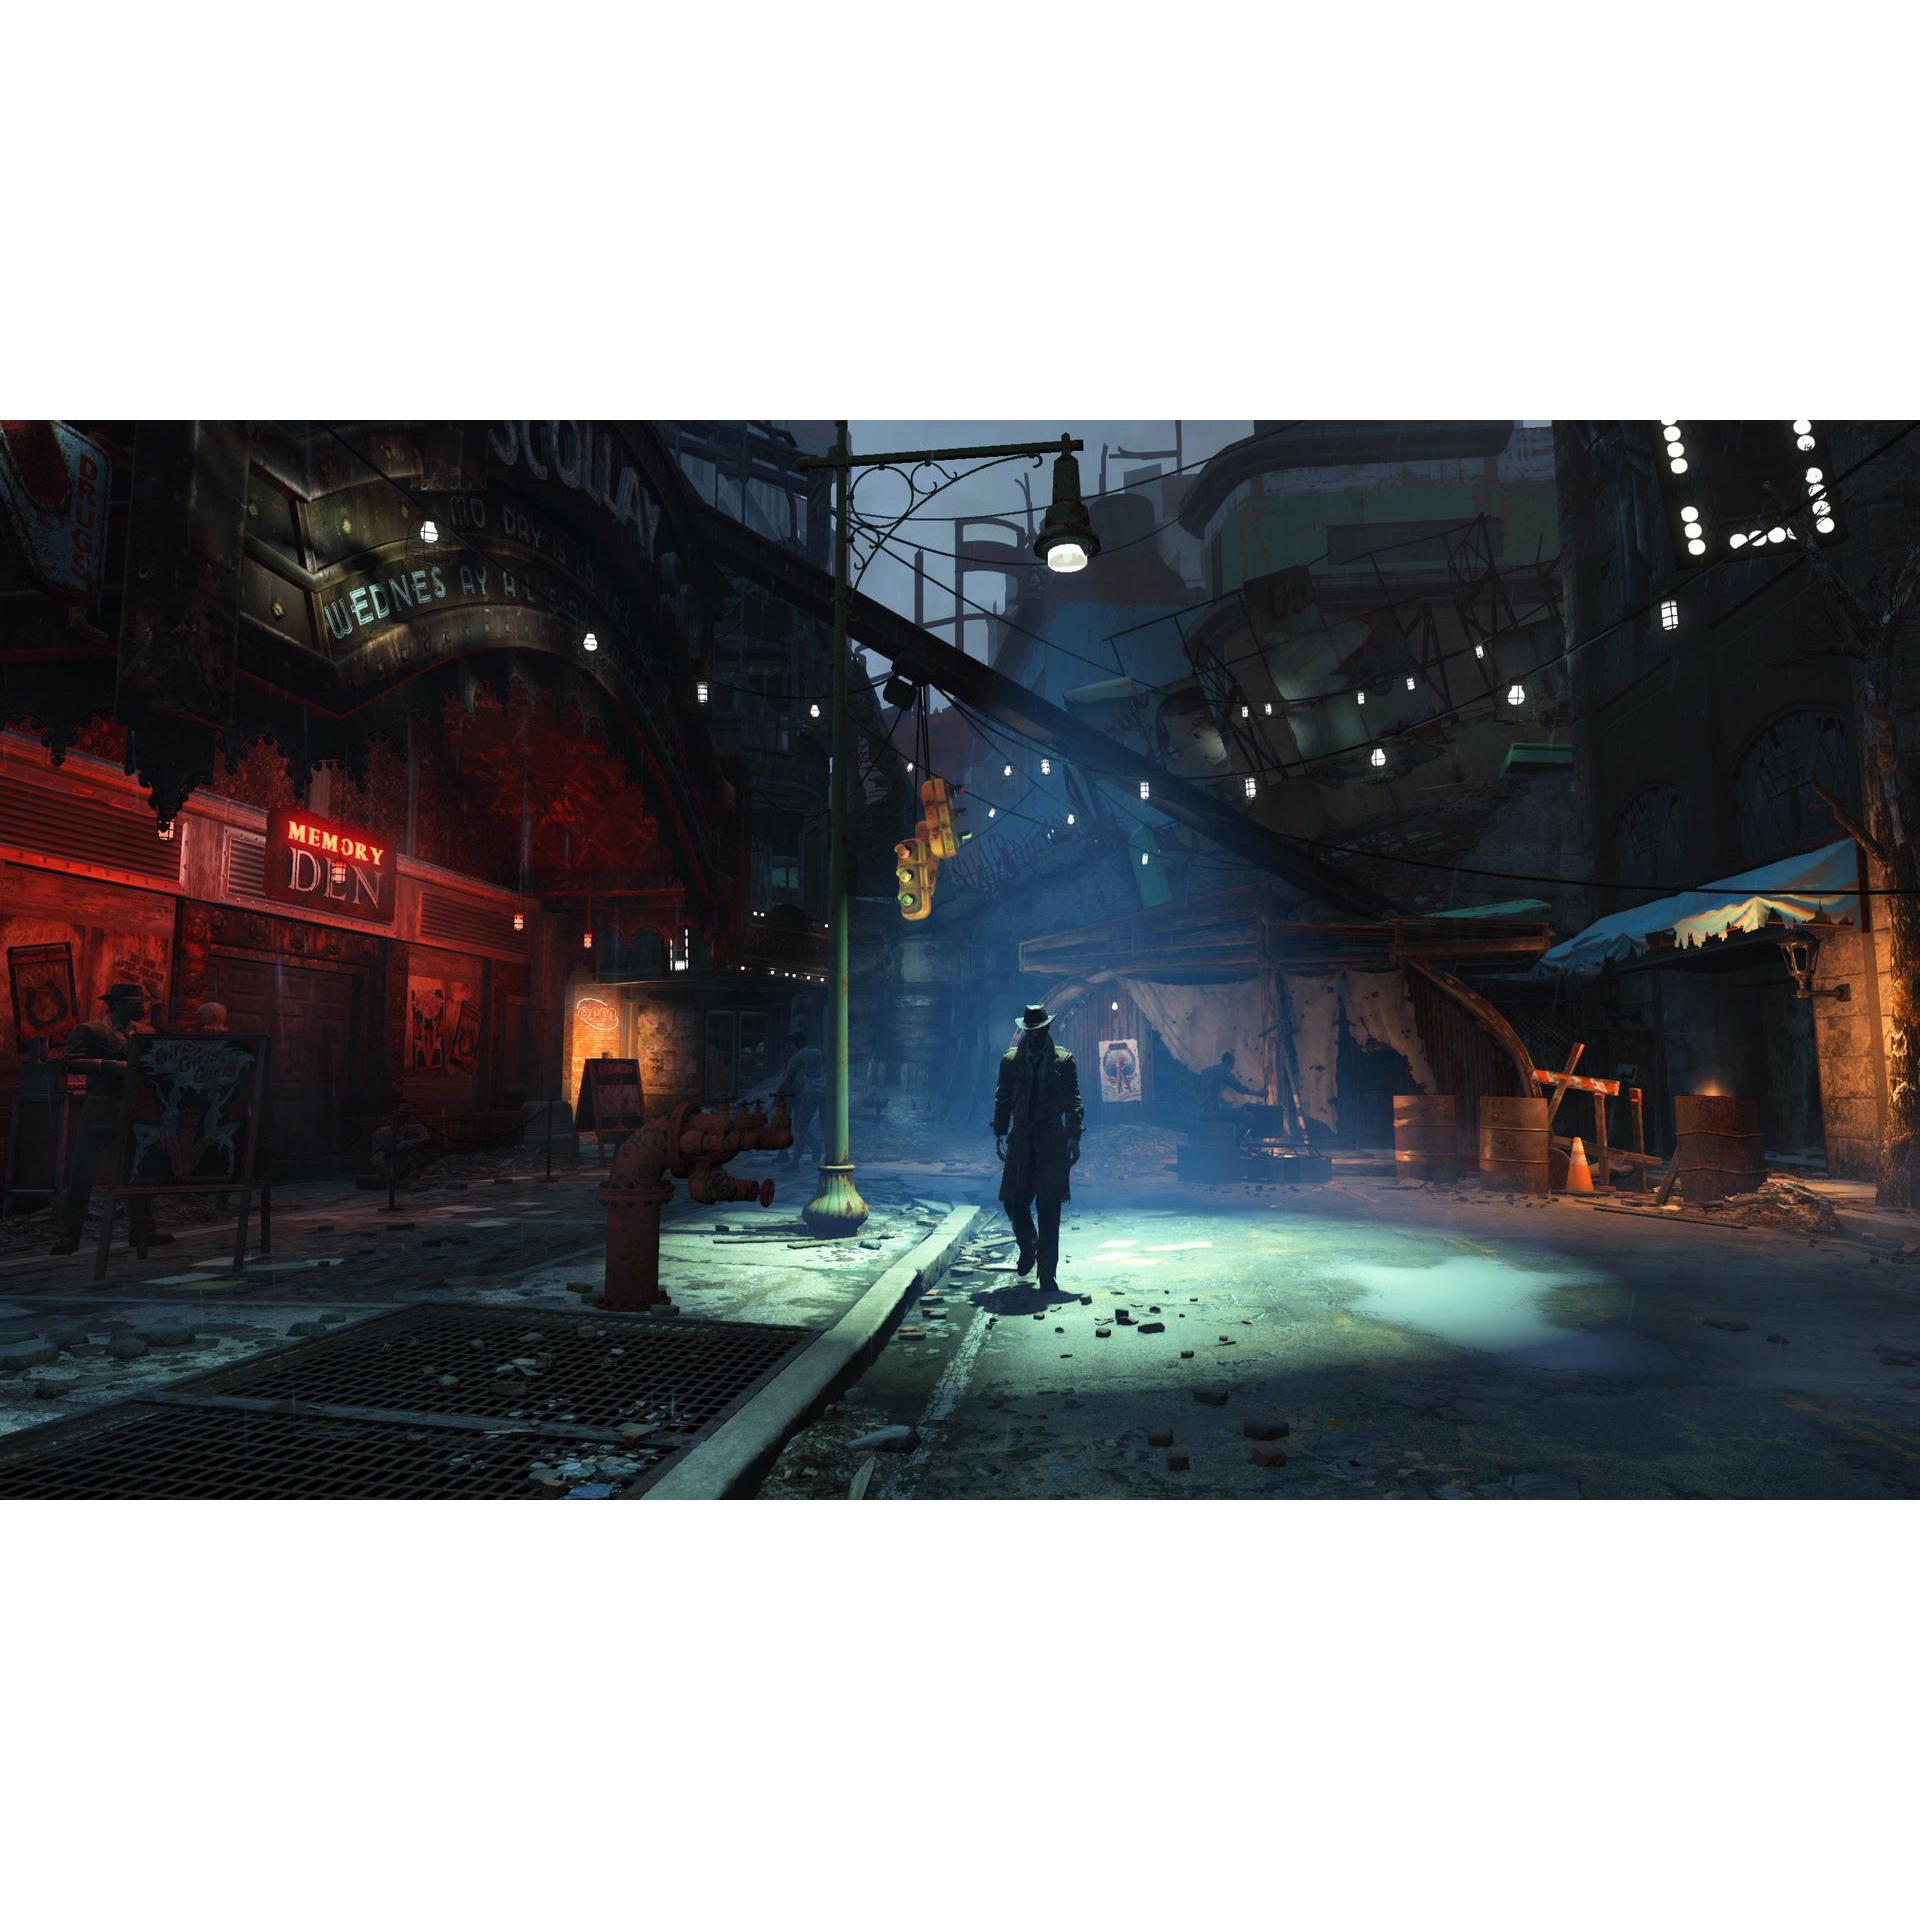 Joc Fallout 4 Goty pentru PlayStation 4 28